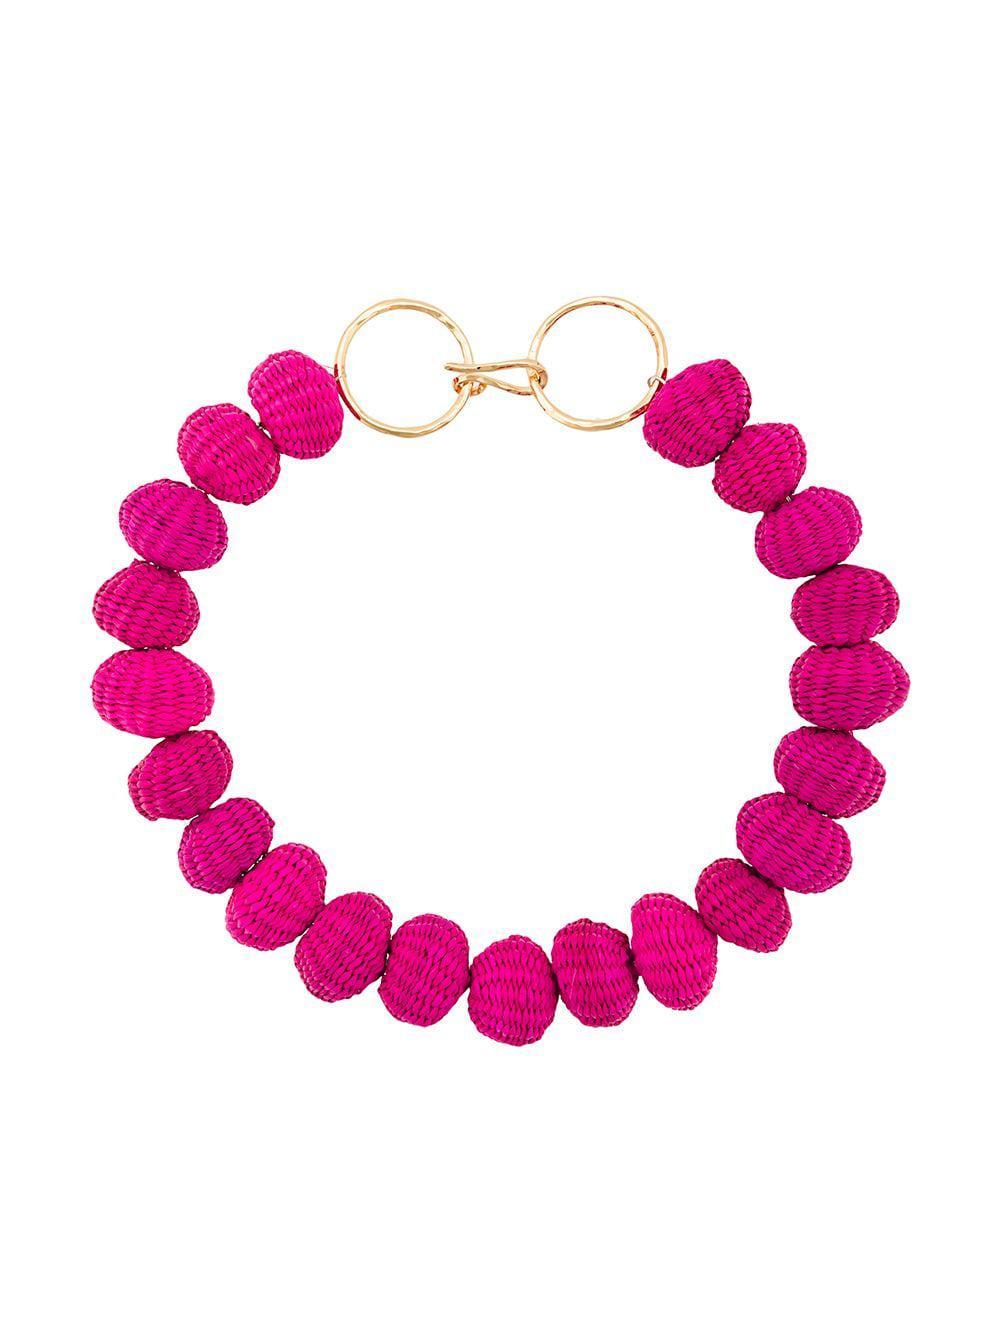 Carolina Herrera Raffia Beads Necklace in Pink & Purple (Pink)